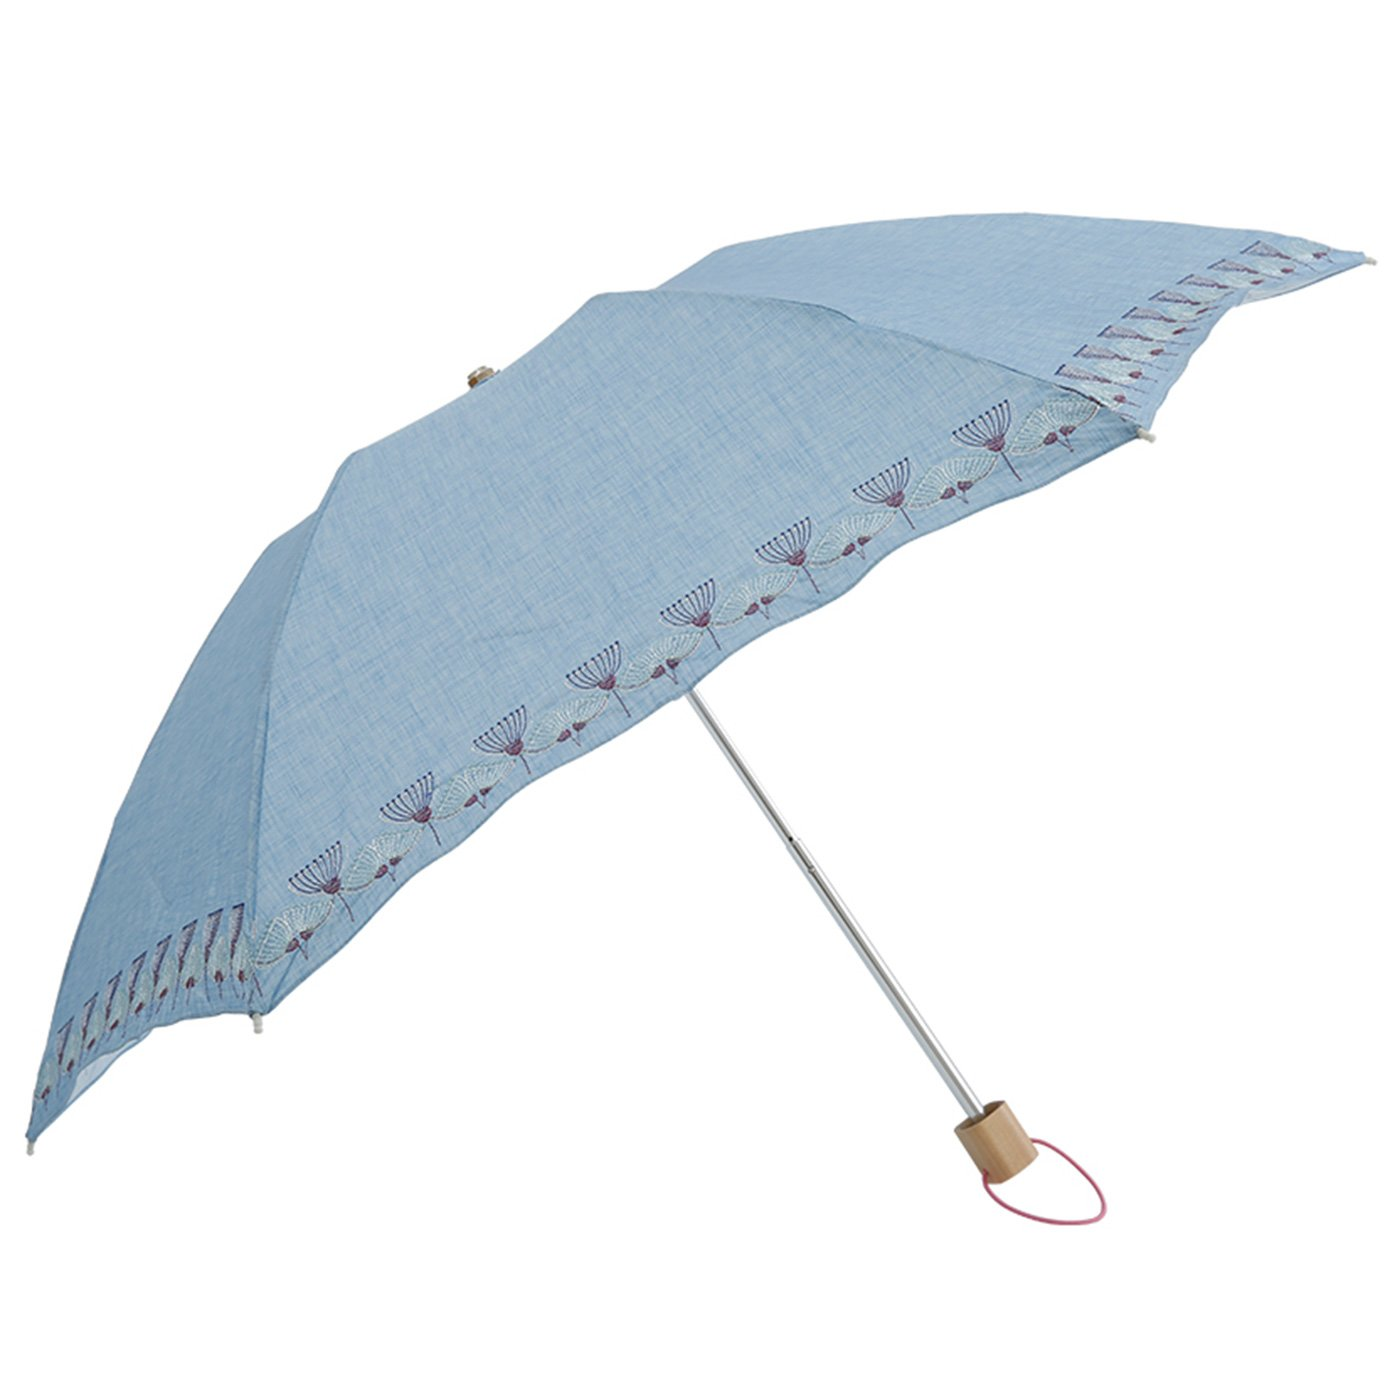 IEDIT[イディット] SELECT korko ウルリクスダール城の庭園をイメージした刺繍の 晴雨兼用折りたたみ日傘〈サックスブルー〉